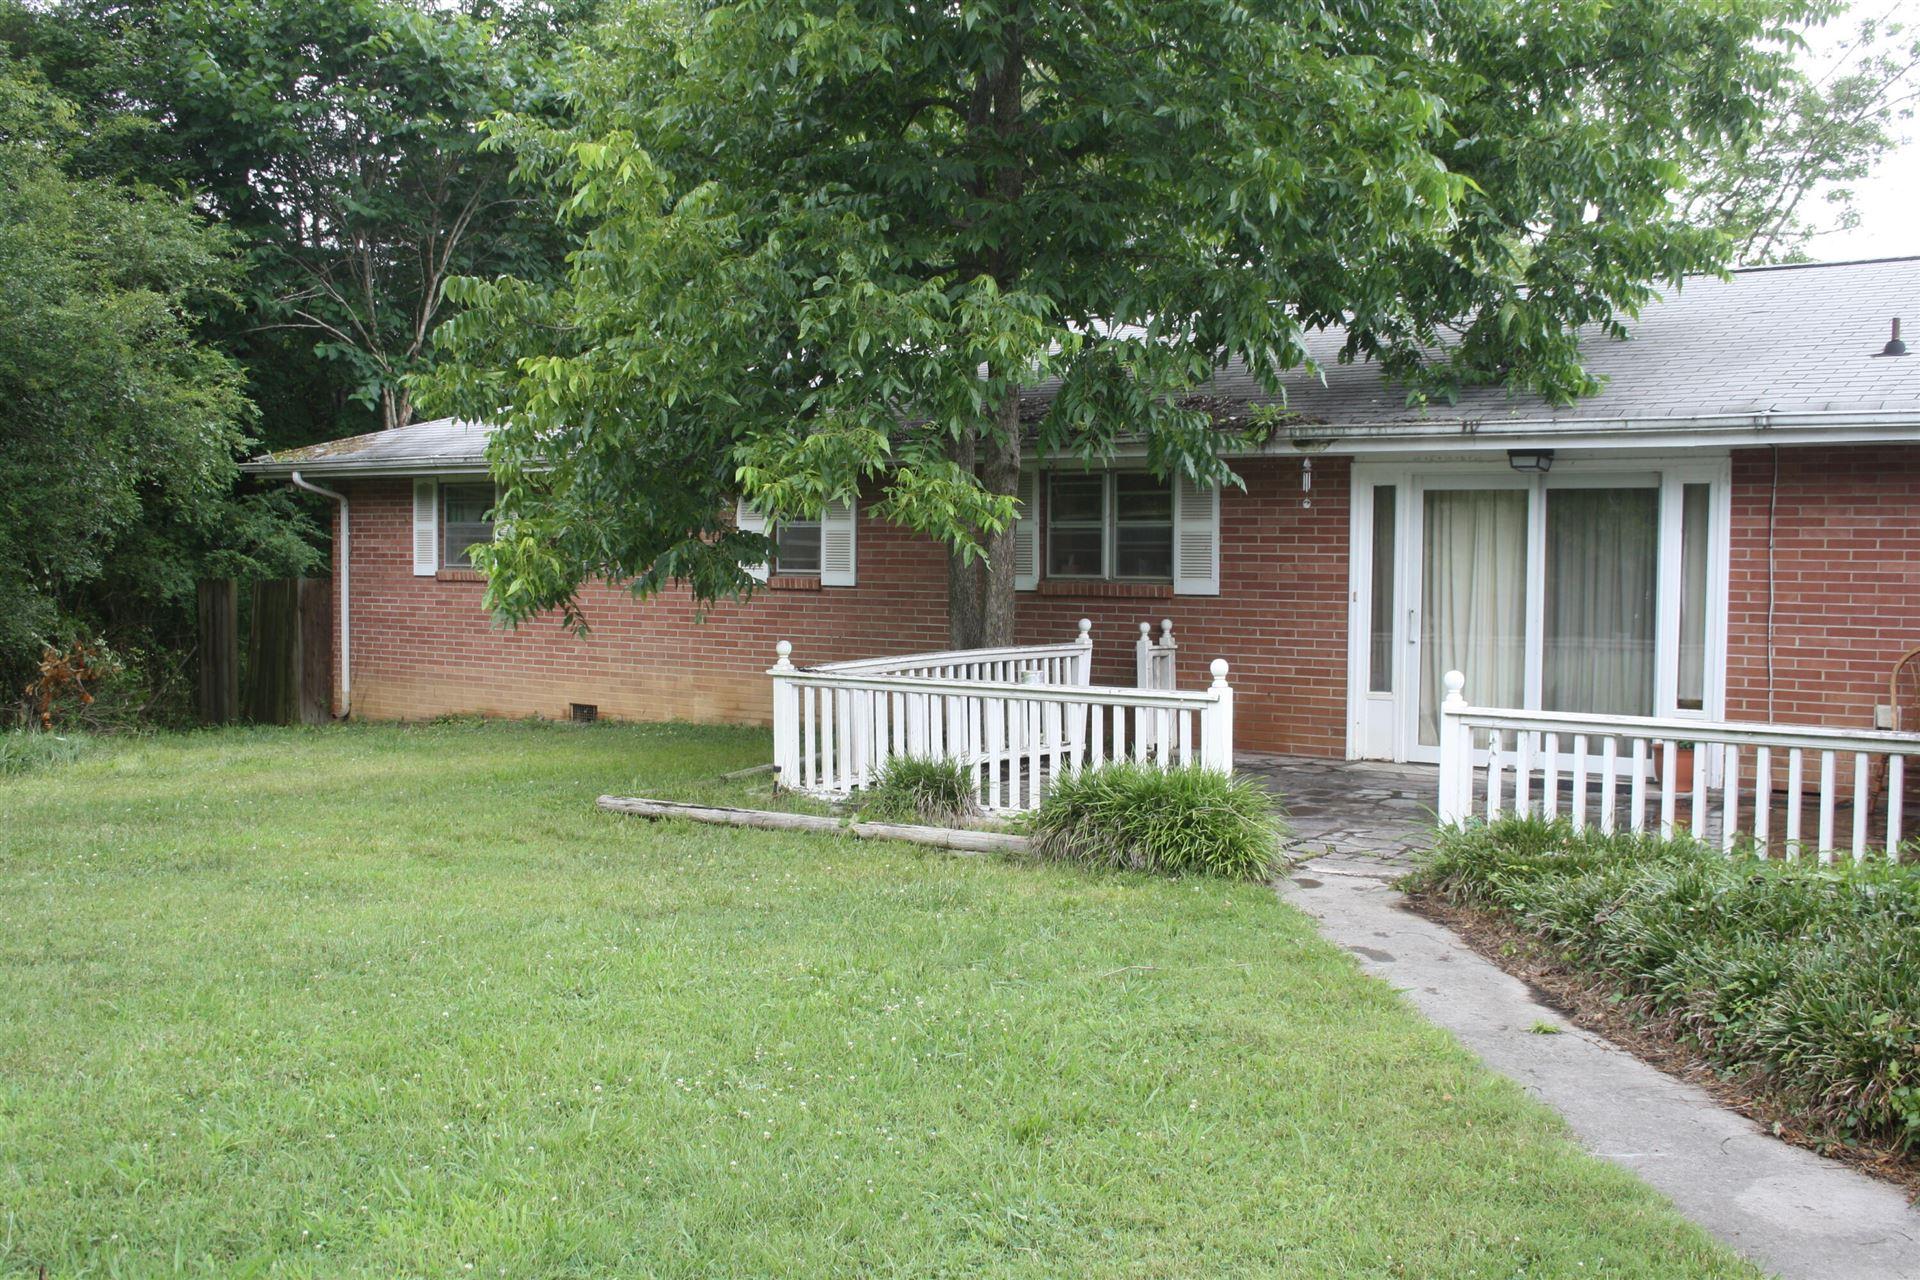 Photo of 2011 Hines Valley Drive, Lenoir City, TN 37771 (MLS # 1160818)